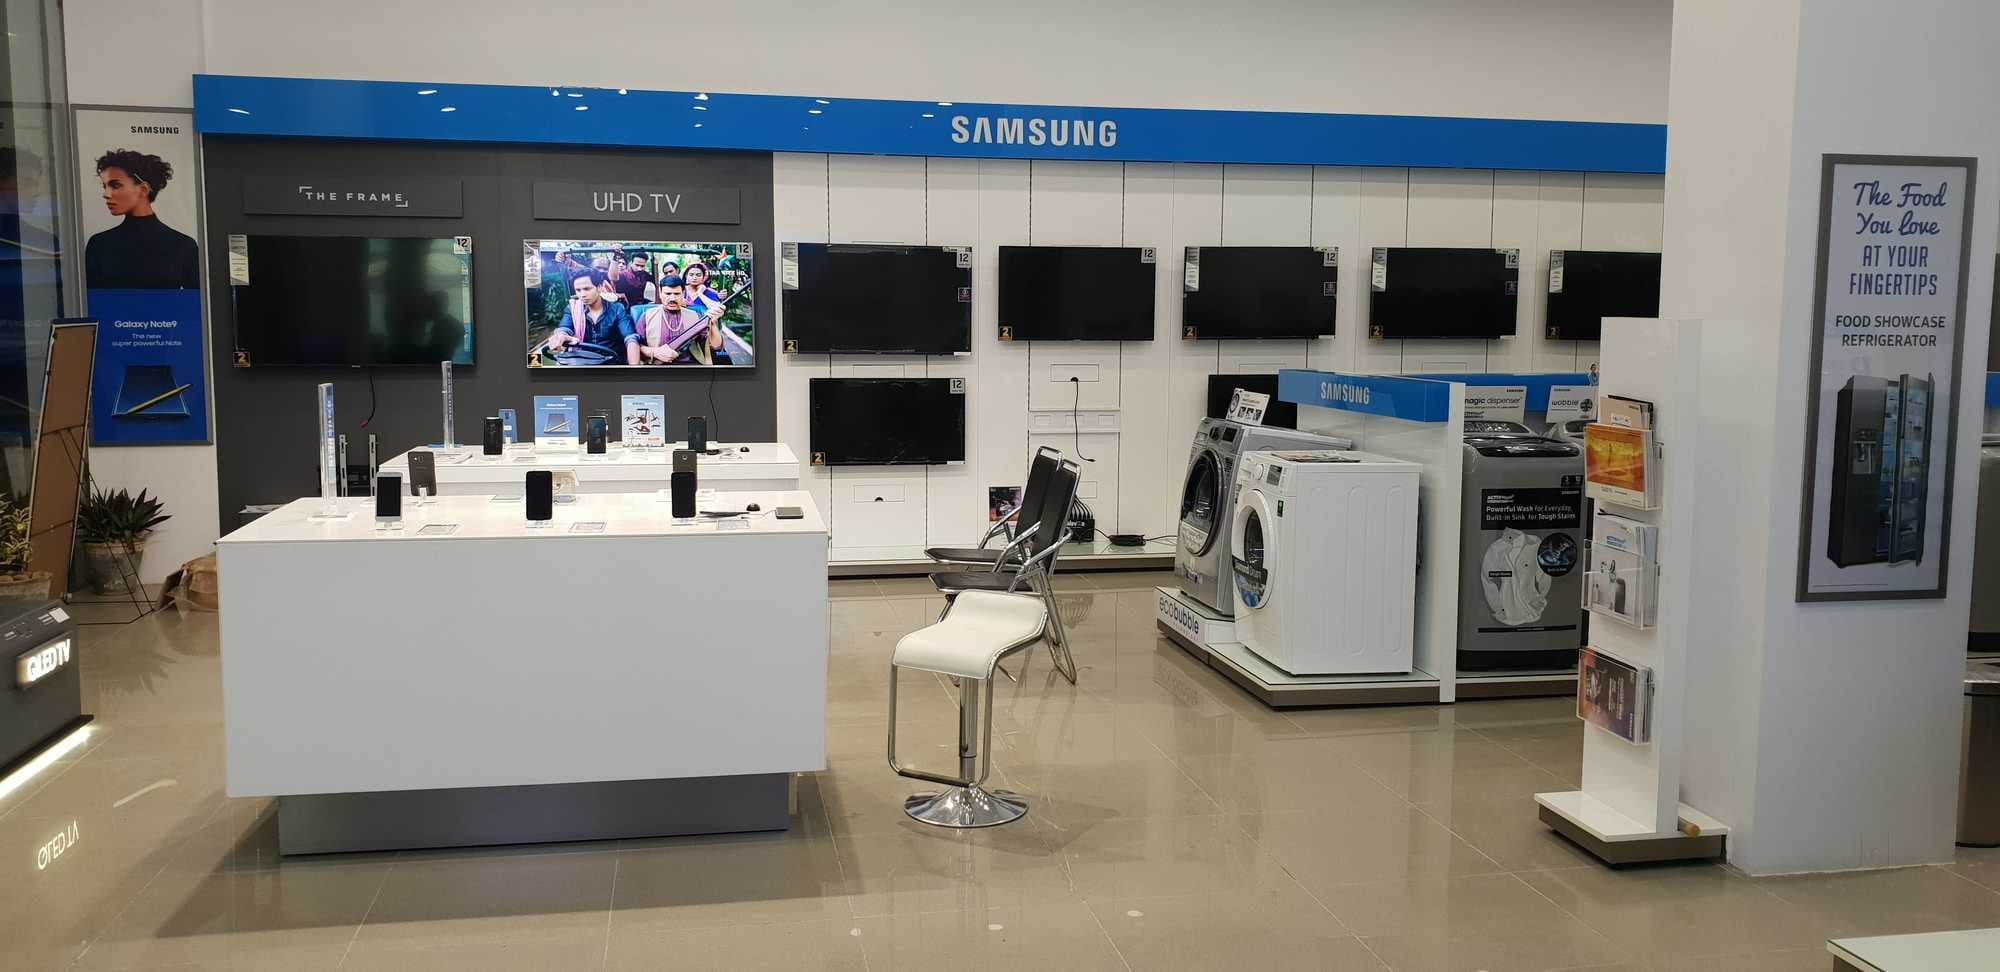 Top Samsung Led Tv Dealers in Kherwara - Best Samsung Led Tv Dealers